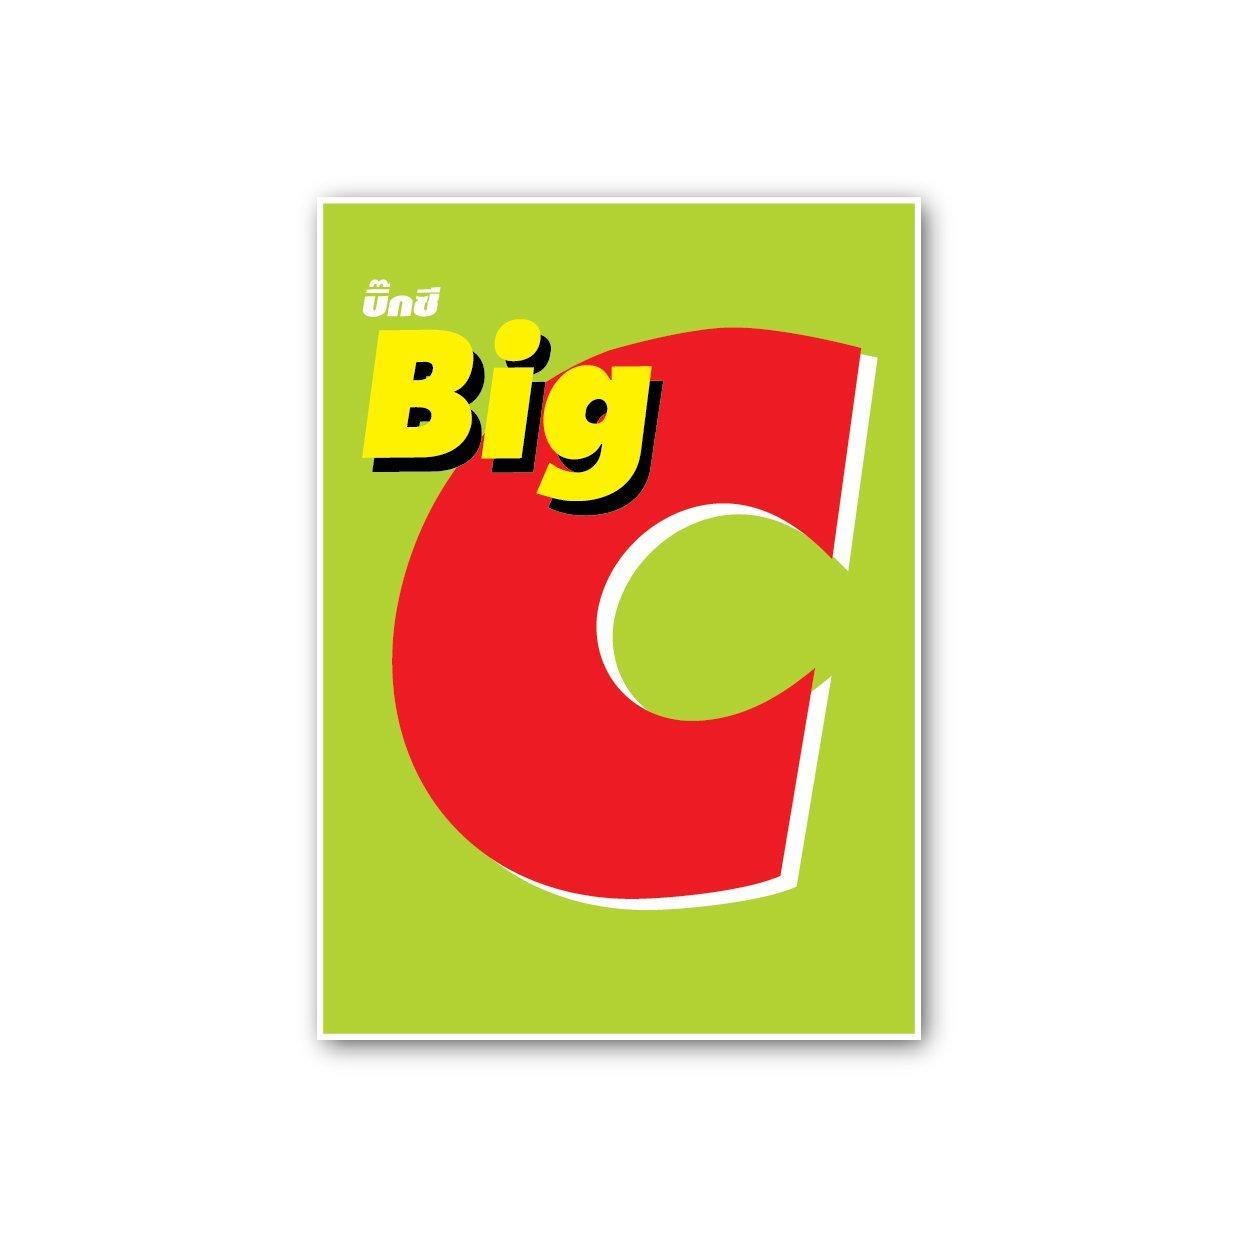 new-eretailer-logo-big-c.jpg